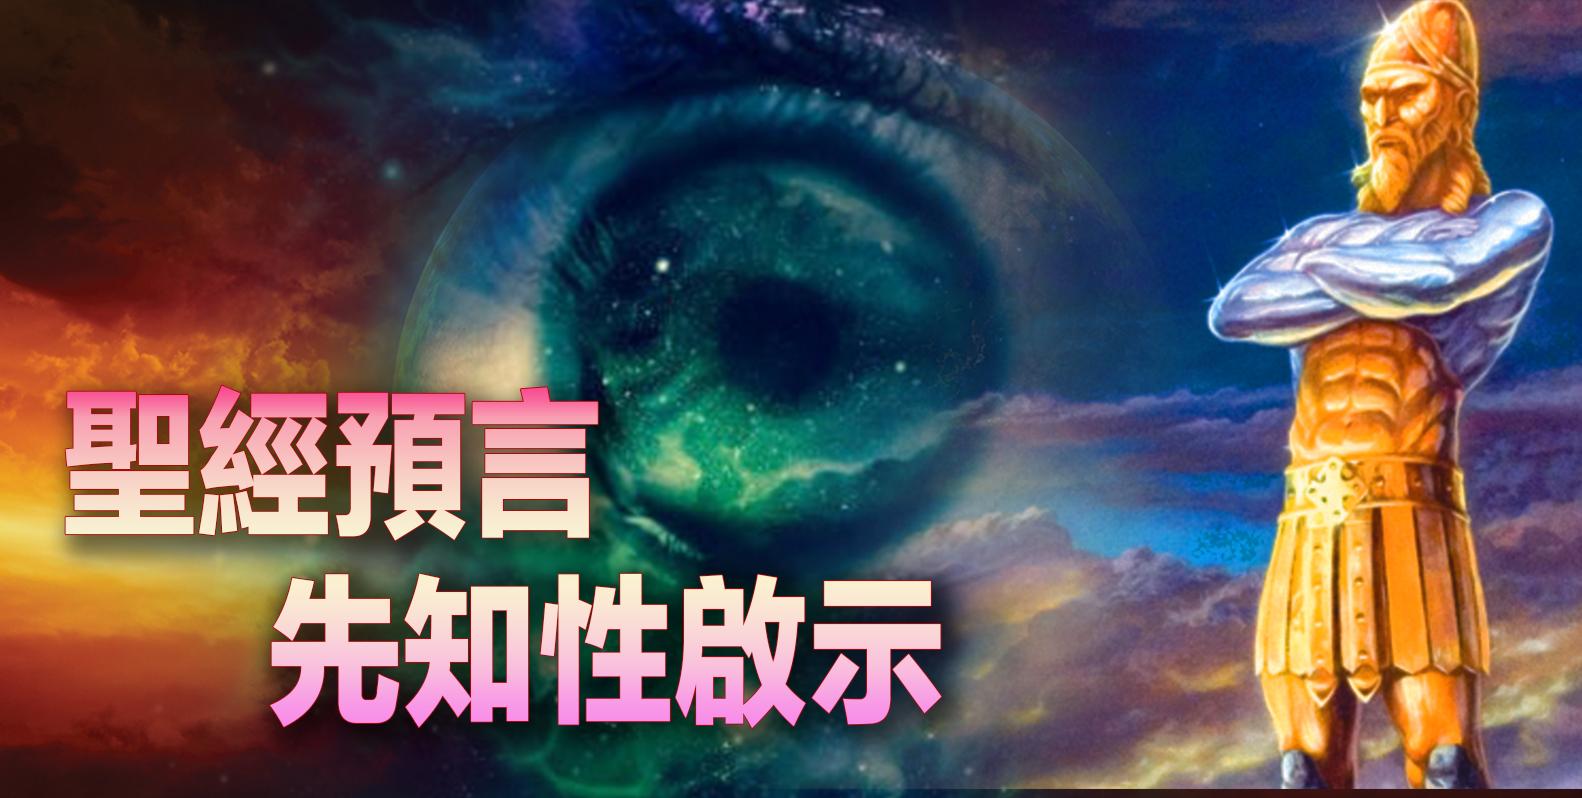 NEW 聖經預言 Banner